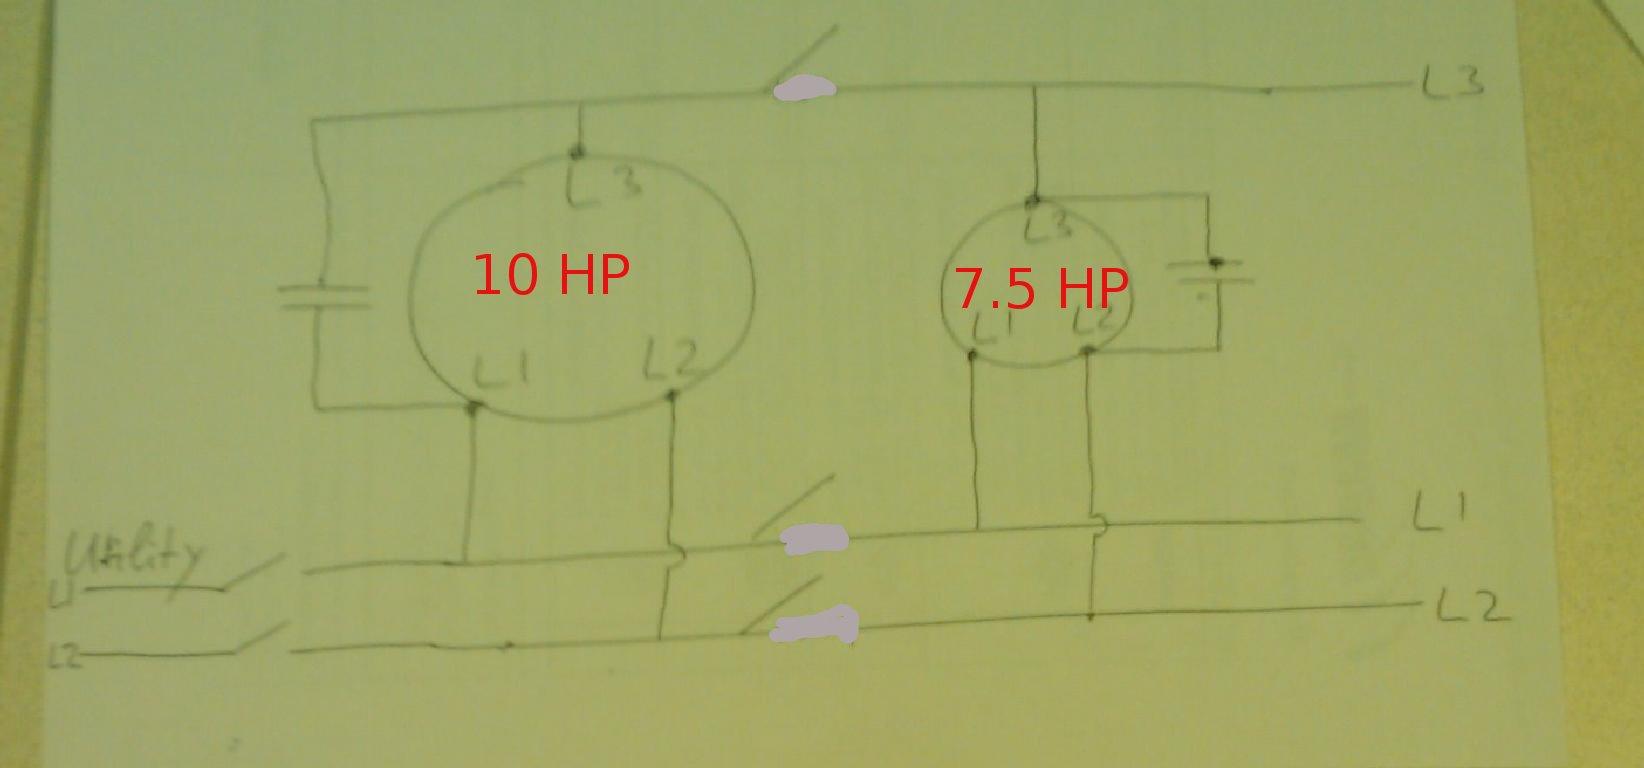 hight resolution of  phoenix phase converter wiring diagram phoenix phase converter on